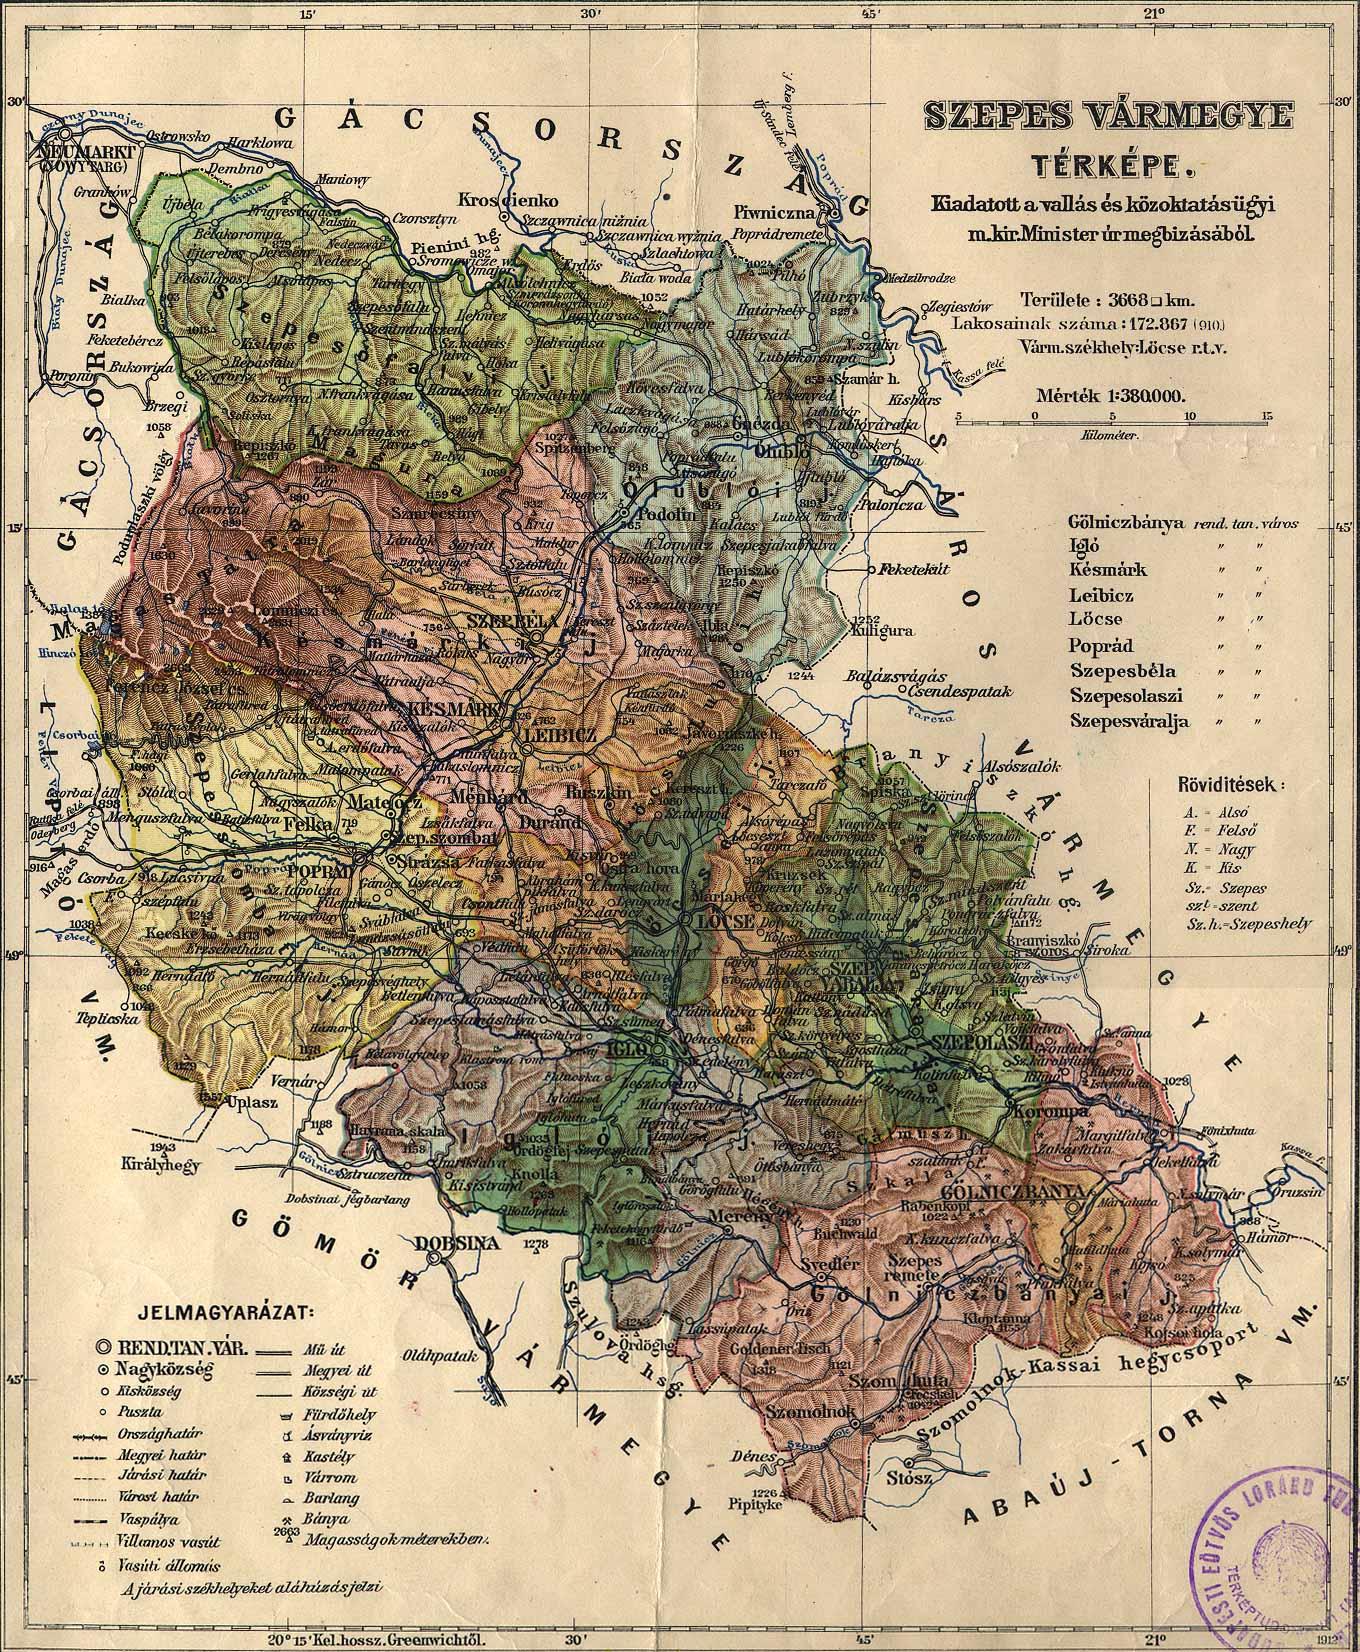 Info Sources: Austro-Hungarian - Genealogy com